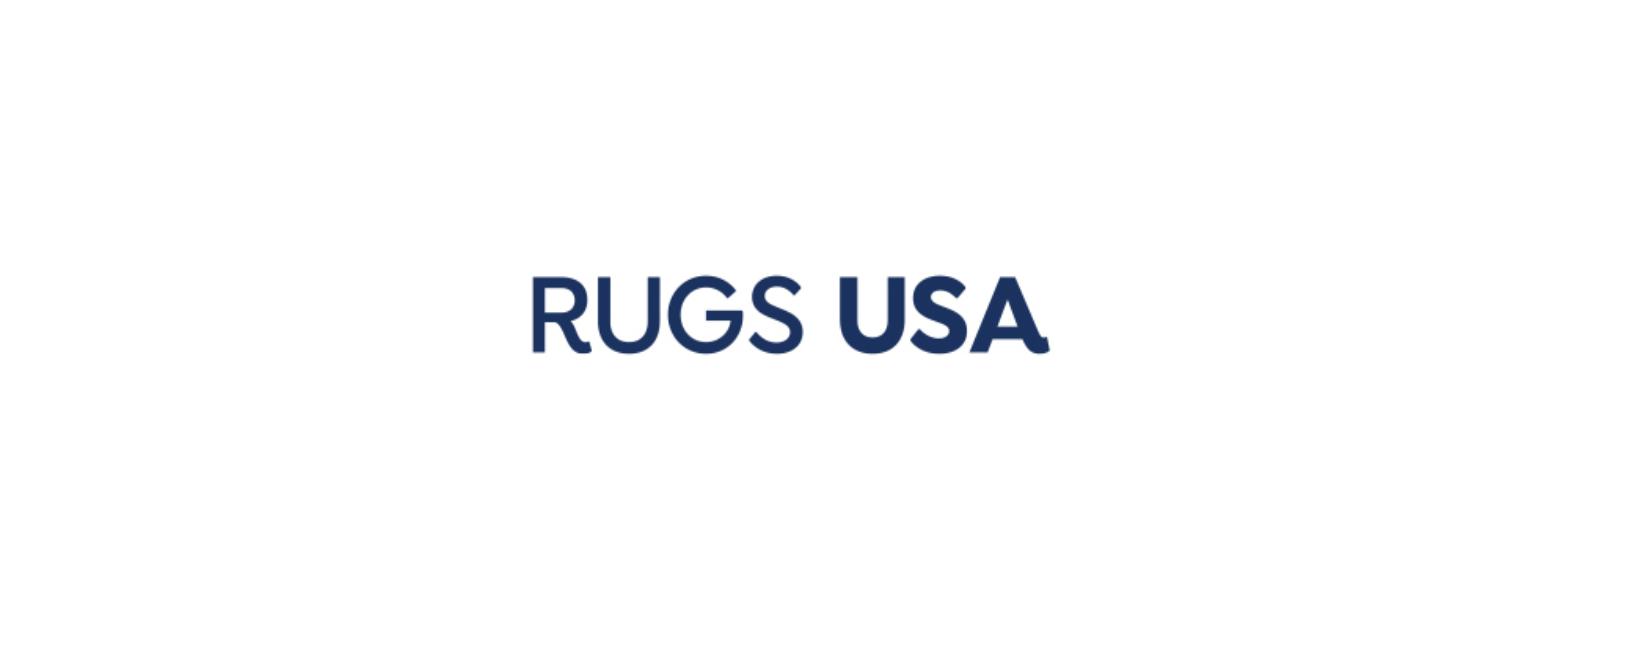 Rugs USA Discount Code 2021